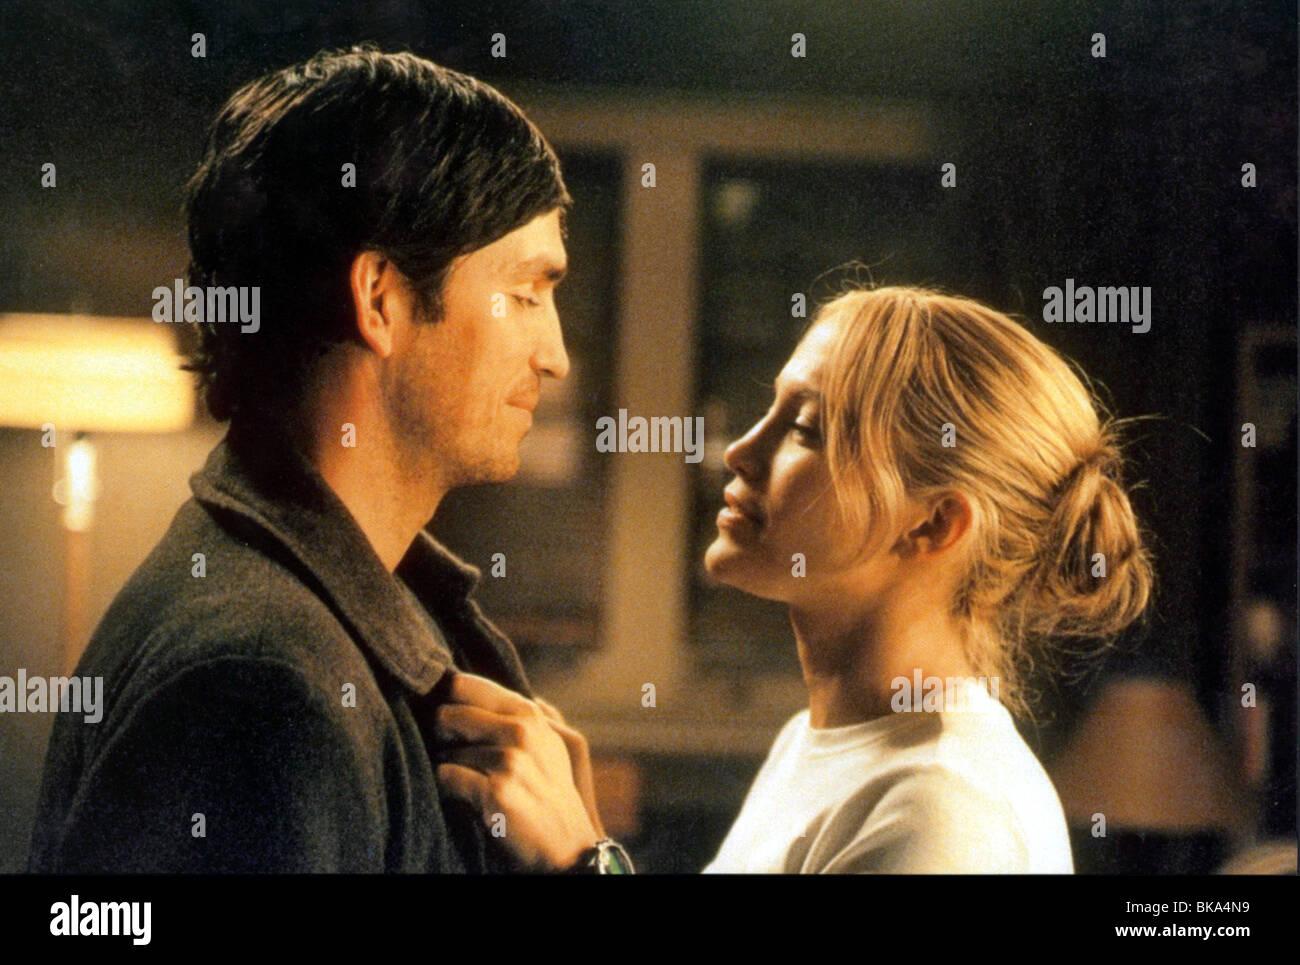 Angel eyes jennifer lopez movie-2076